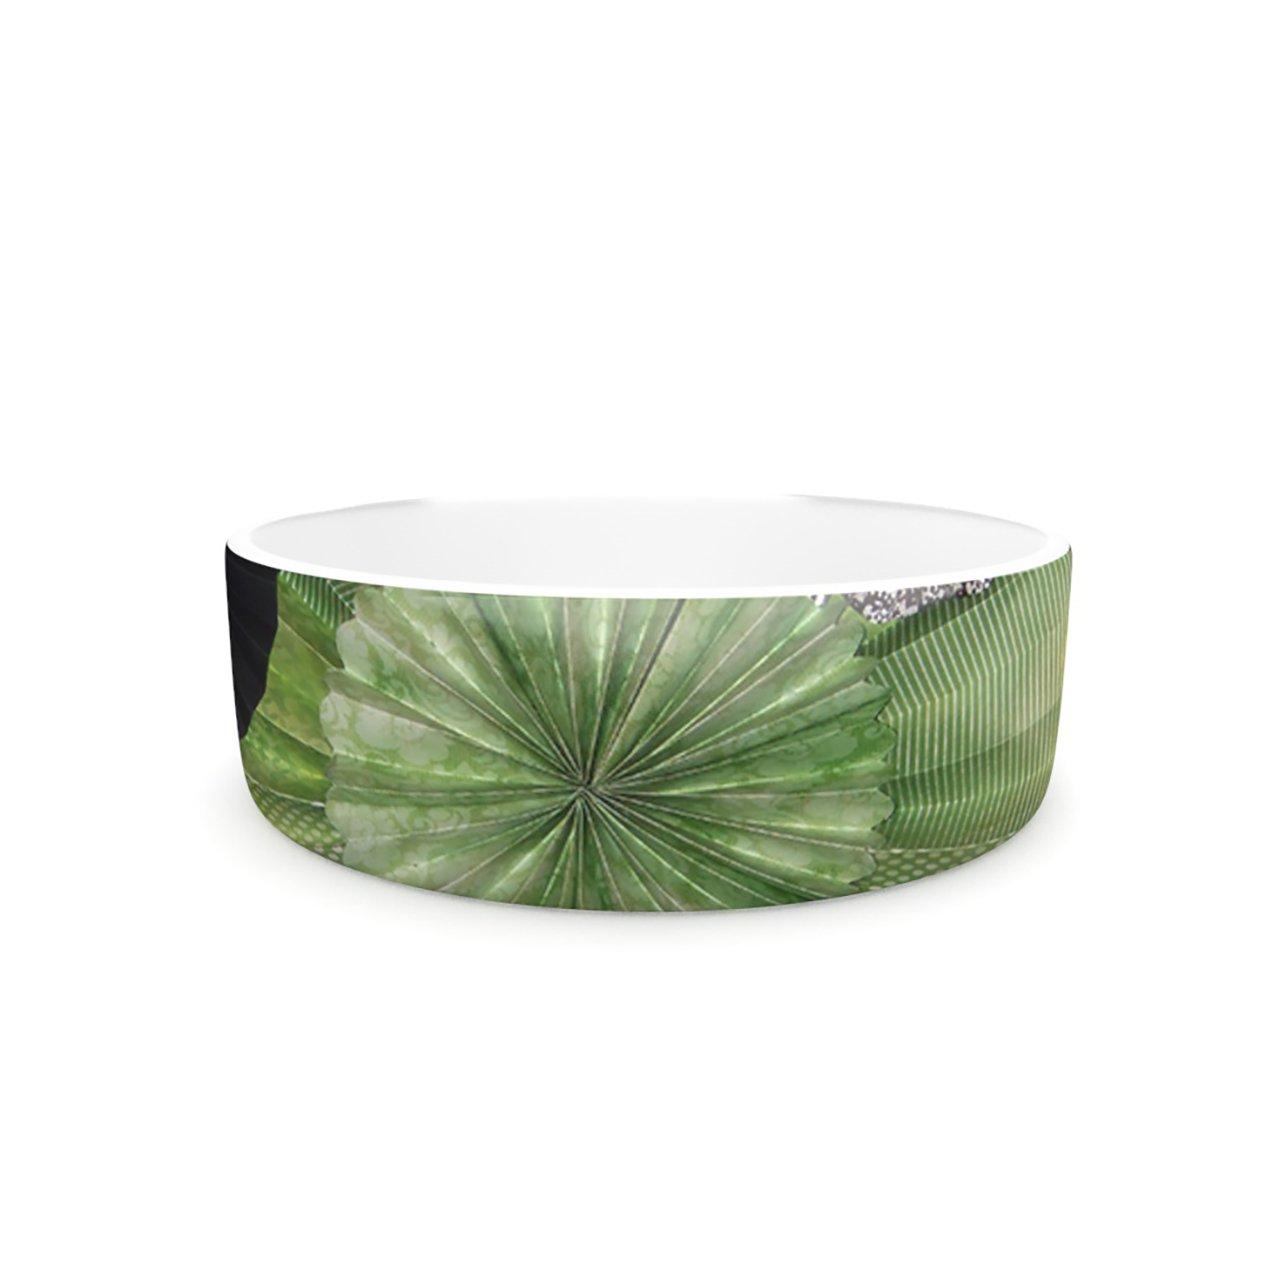 Kess InHouse Heidi Jennings Serenity  Pet Bowl, 7-Inch, Green Grey